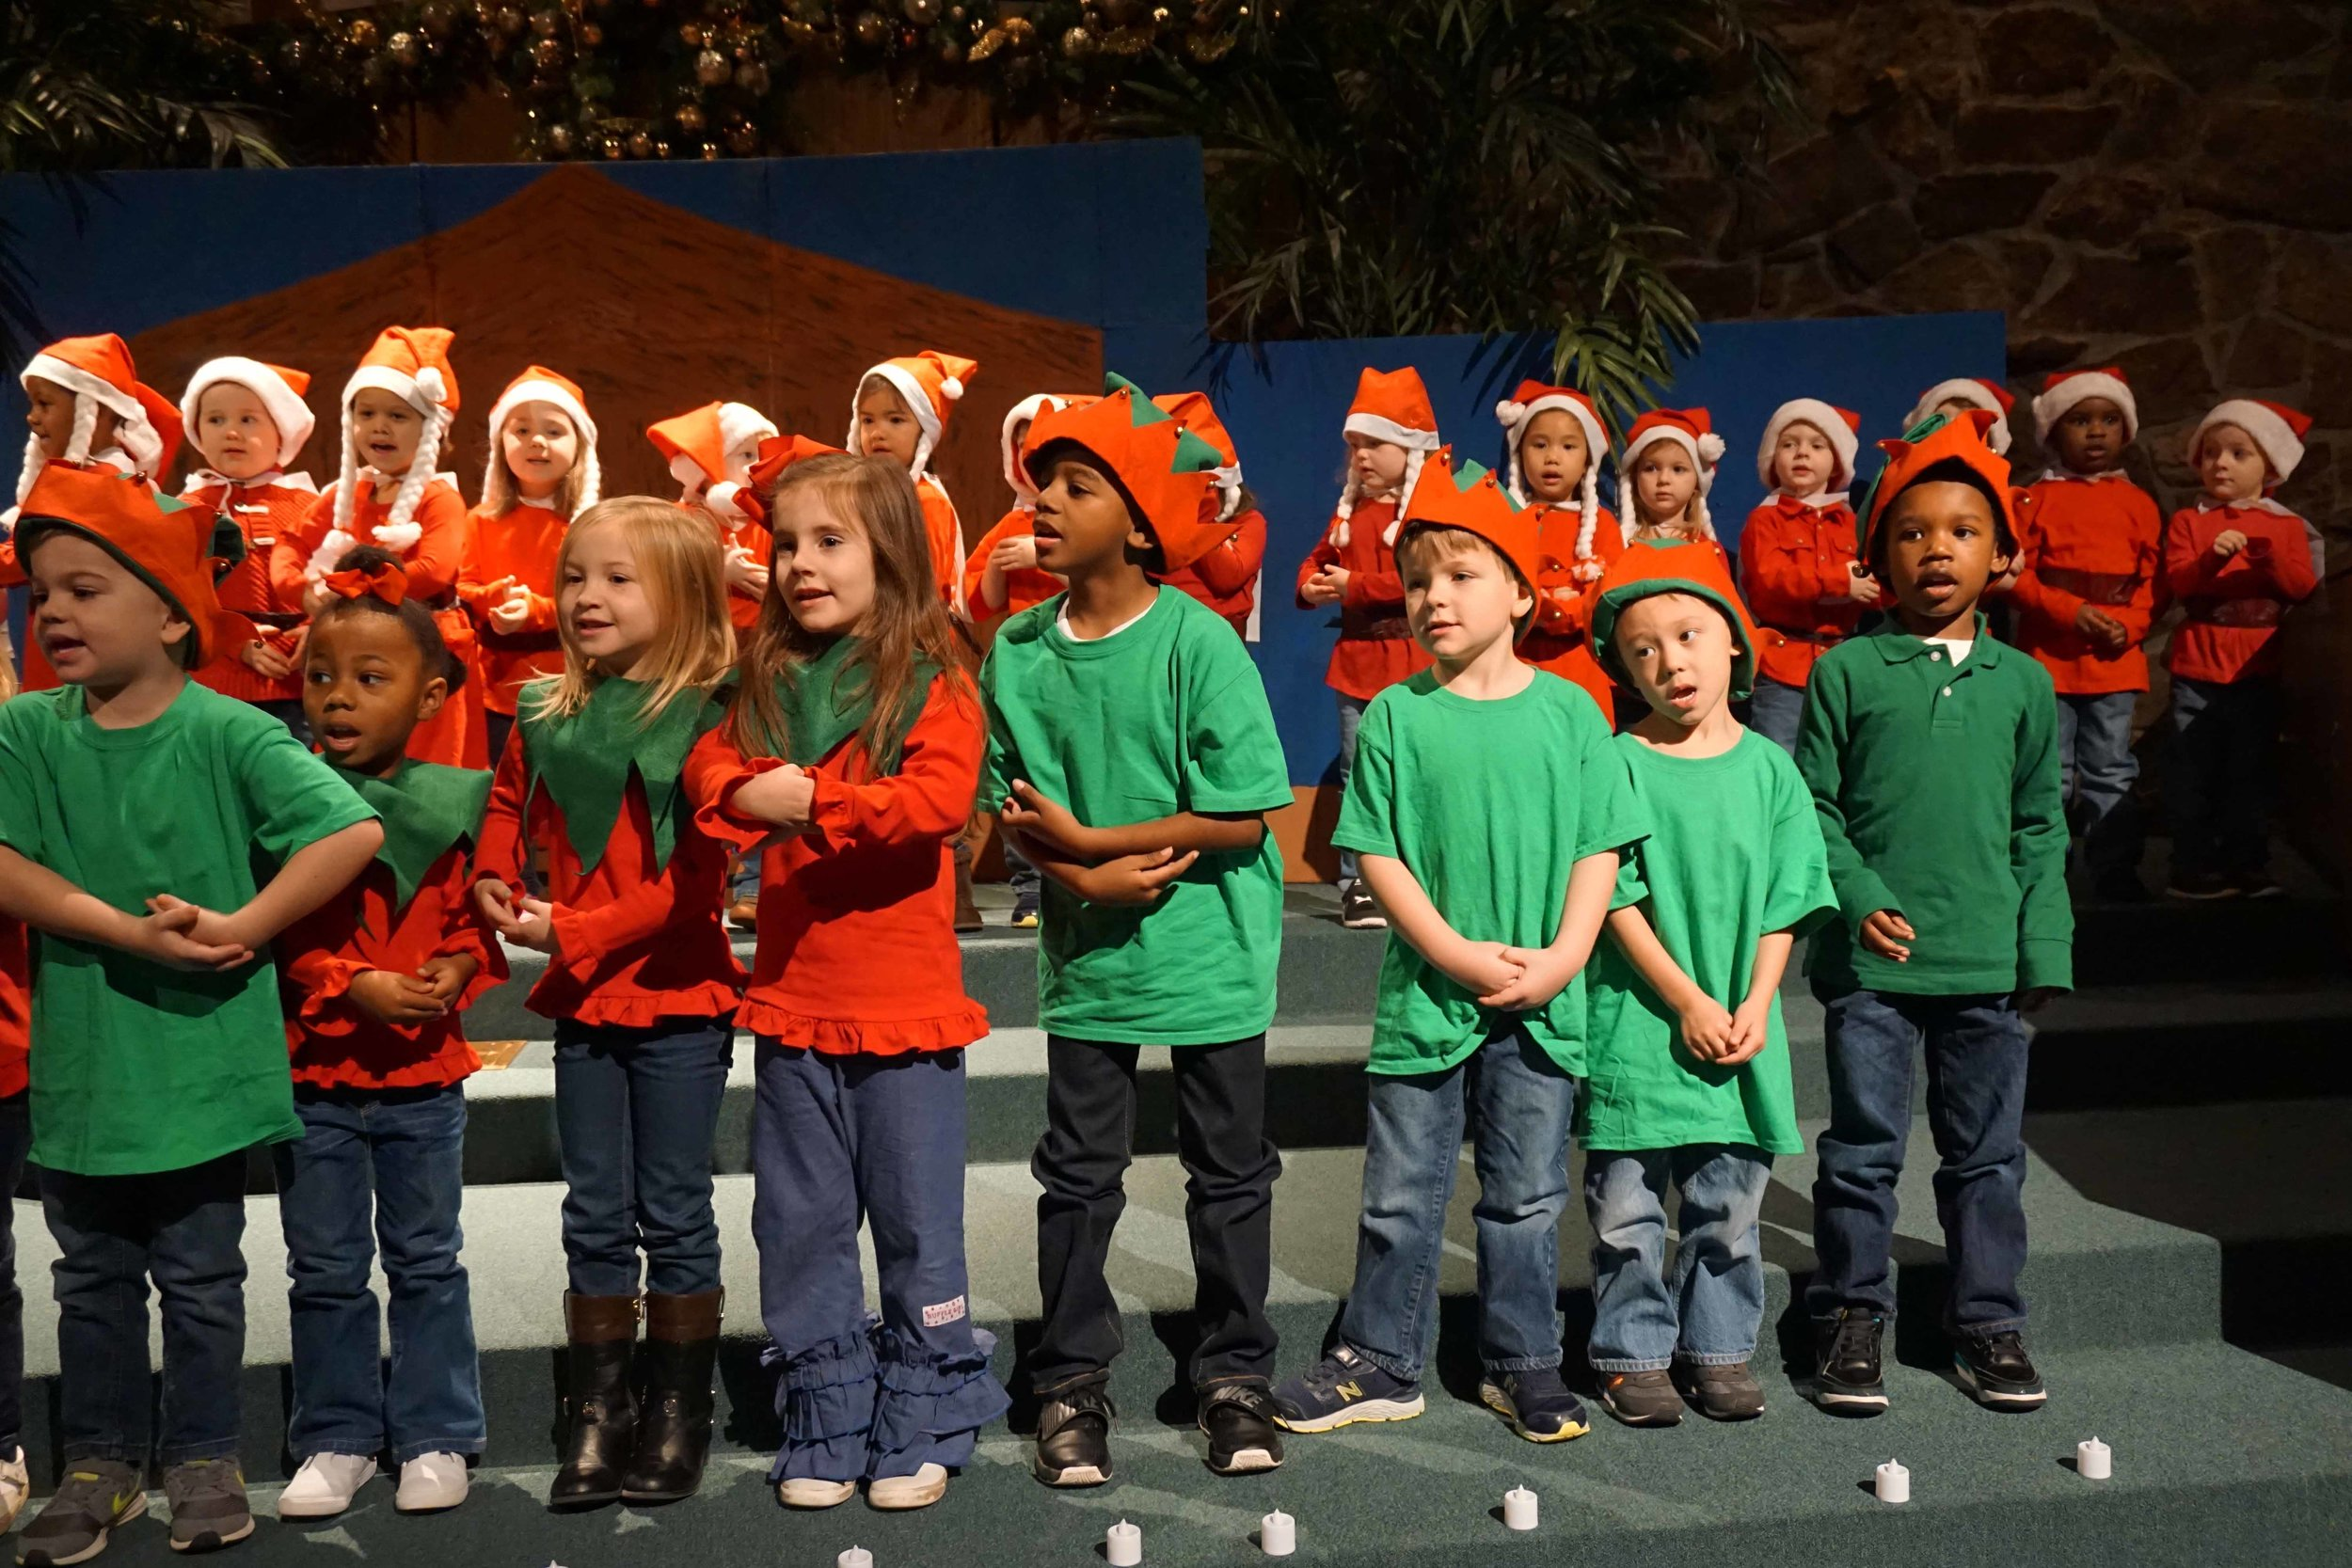 Dec13 WSLH ChristmasProgramJKjungle&OceanRooms40.jpg